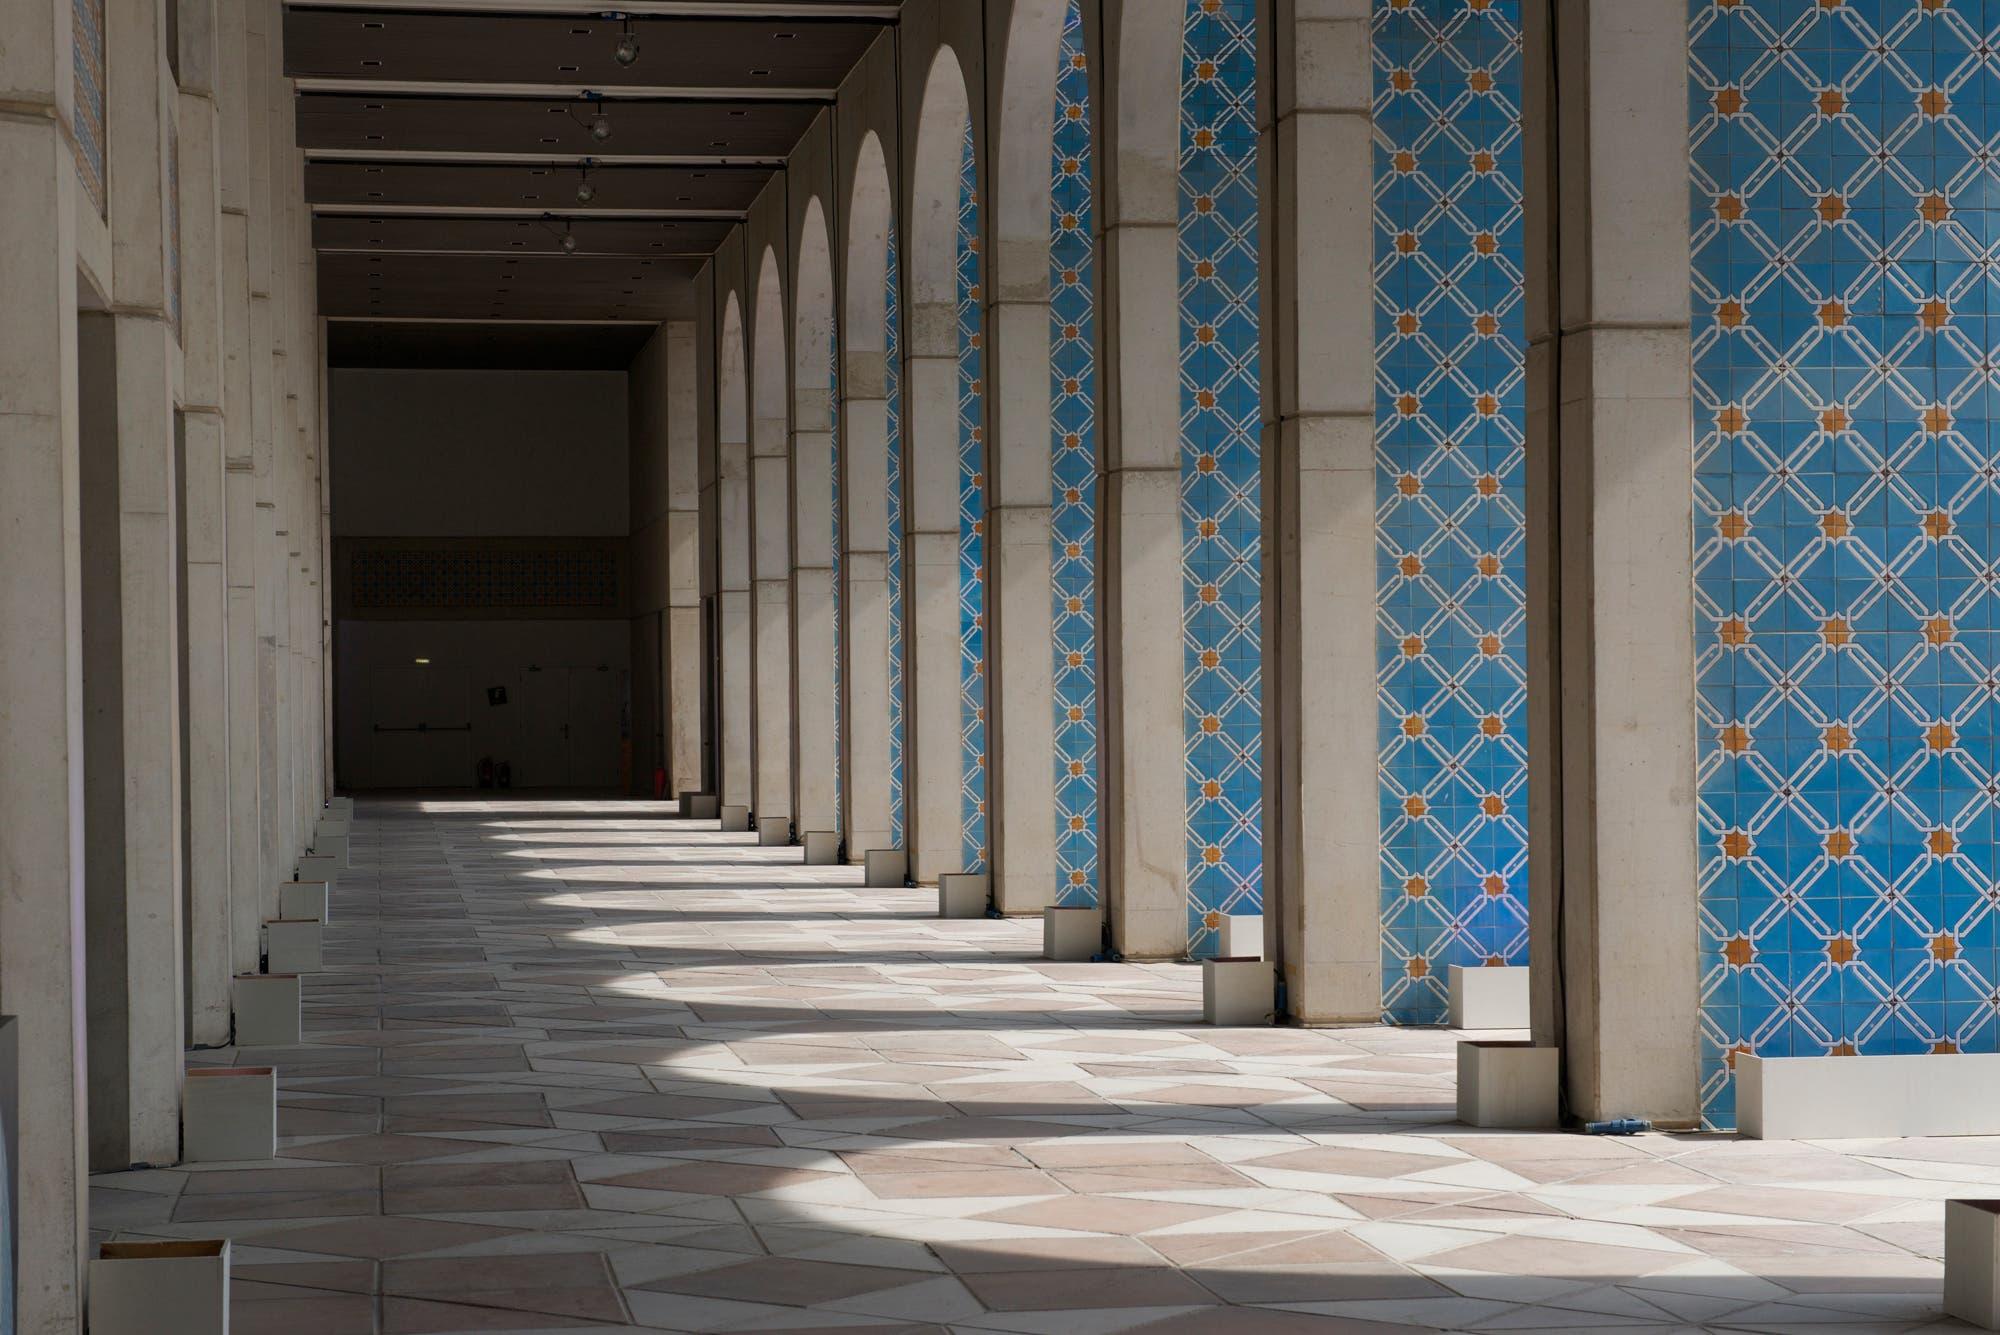 Qasr Al Hosn Festival (Peter Harrison)